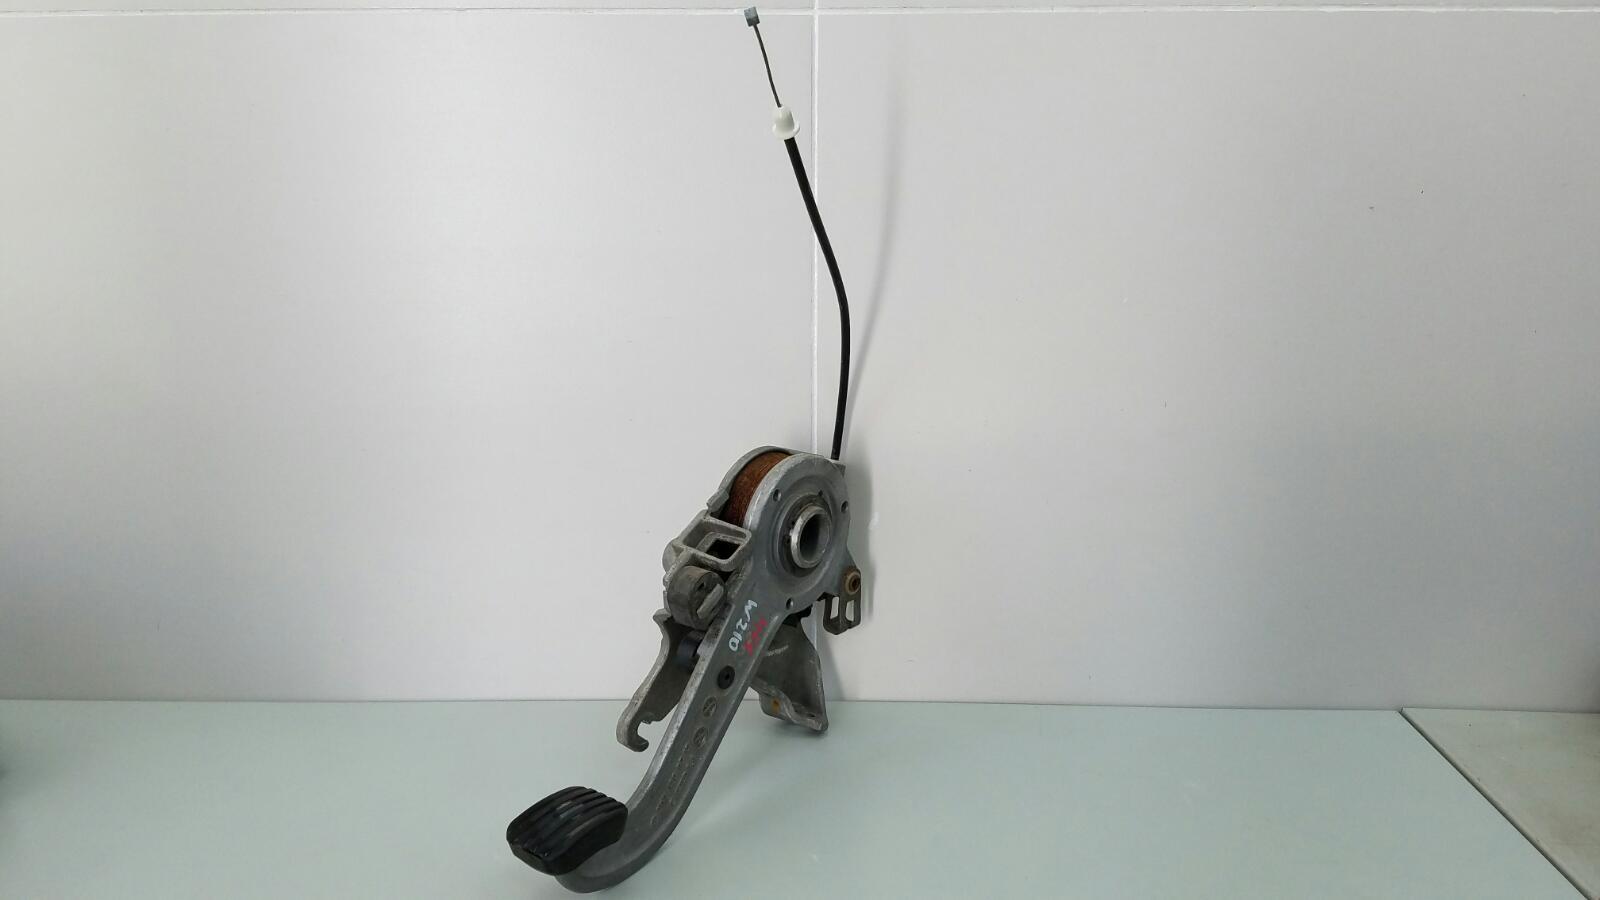 Педаль стояночного тормоза ножник Mercedes E230 W210 M111.970 1995